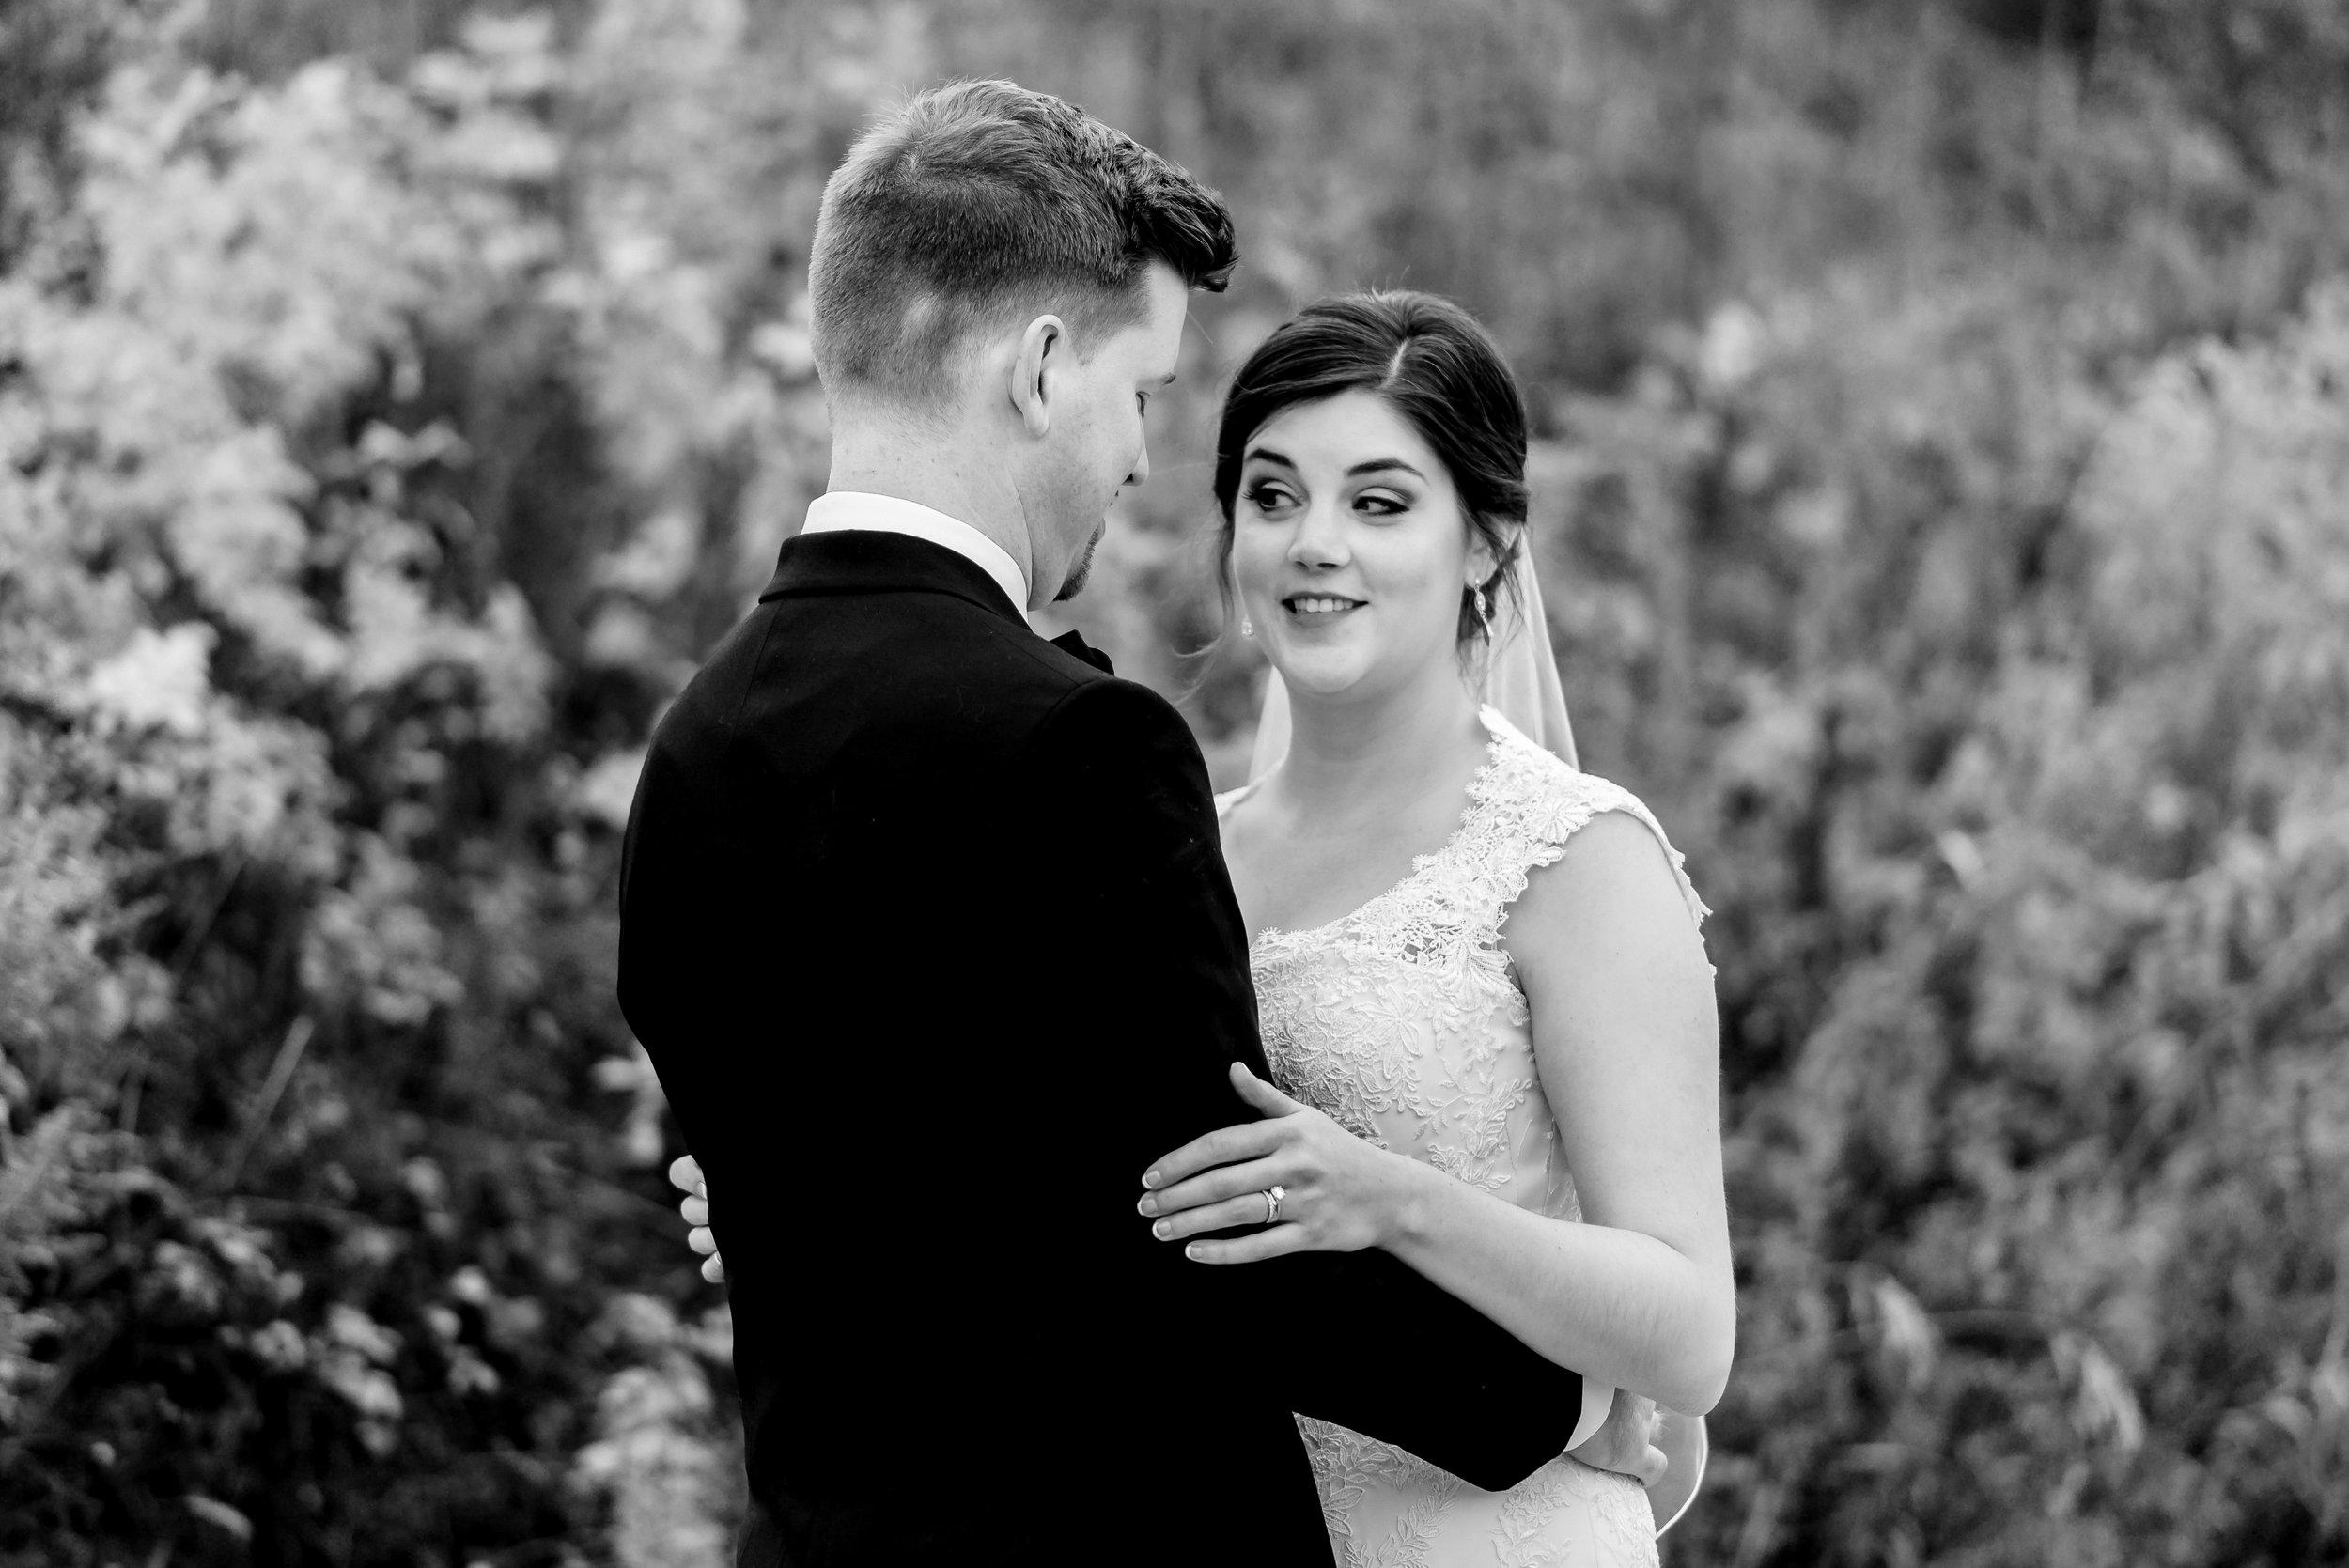 Lauren and Karl - Van Dusen Mansion Wedding and St. Olaf Catholic Church Minneapolis Wedding BW-573.jpg